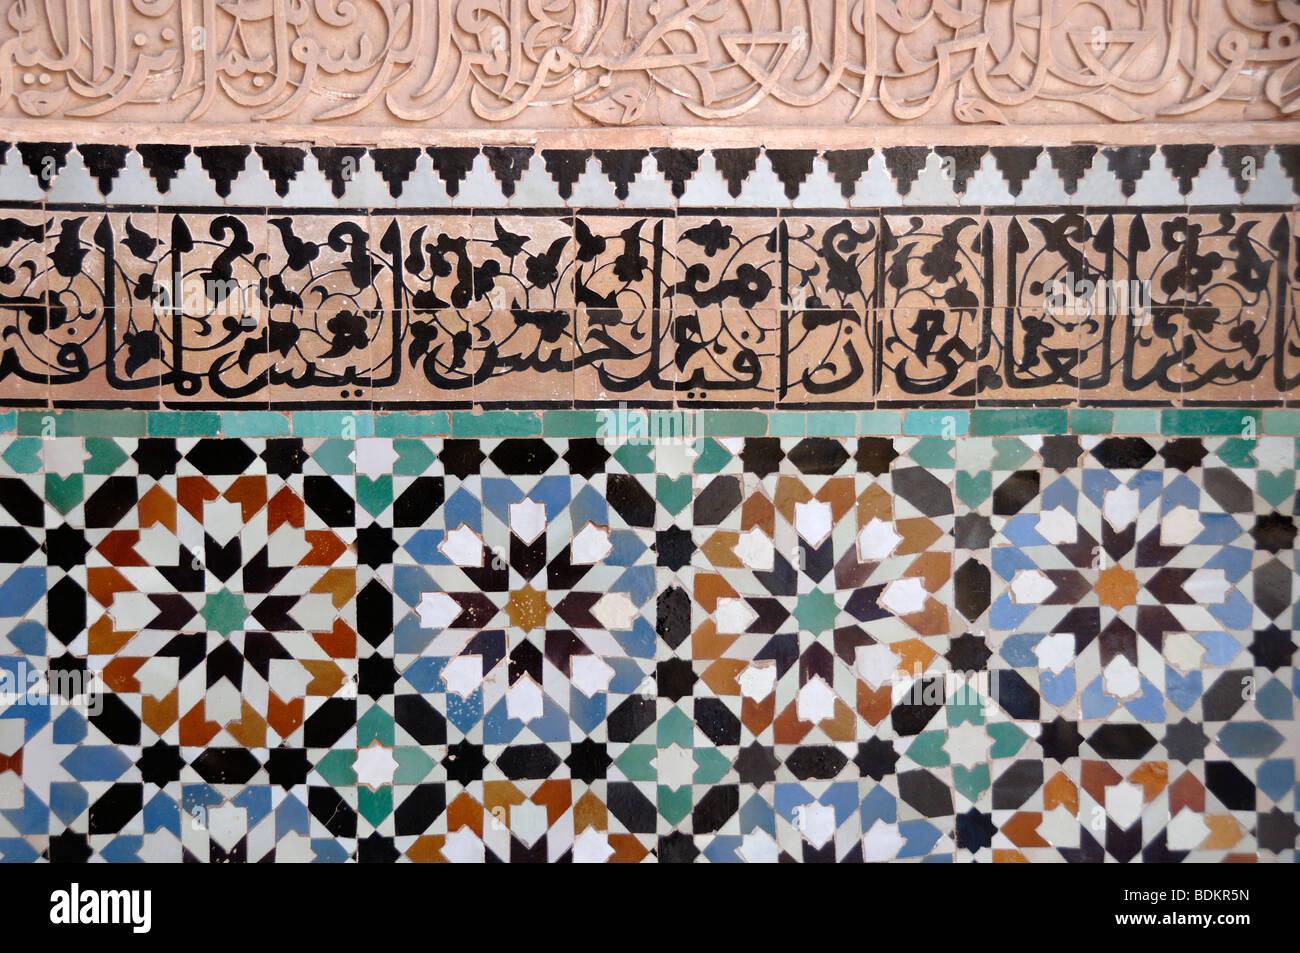 Islamic Tile Work : Arabic script and islamic tiling or tile work at the ali